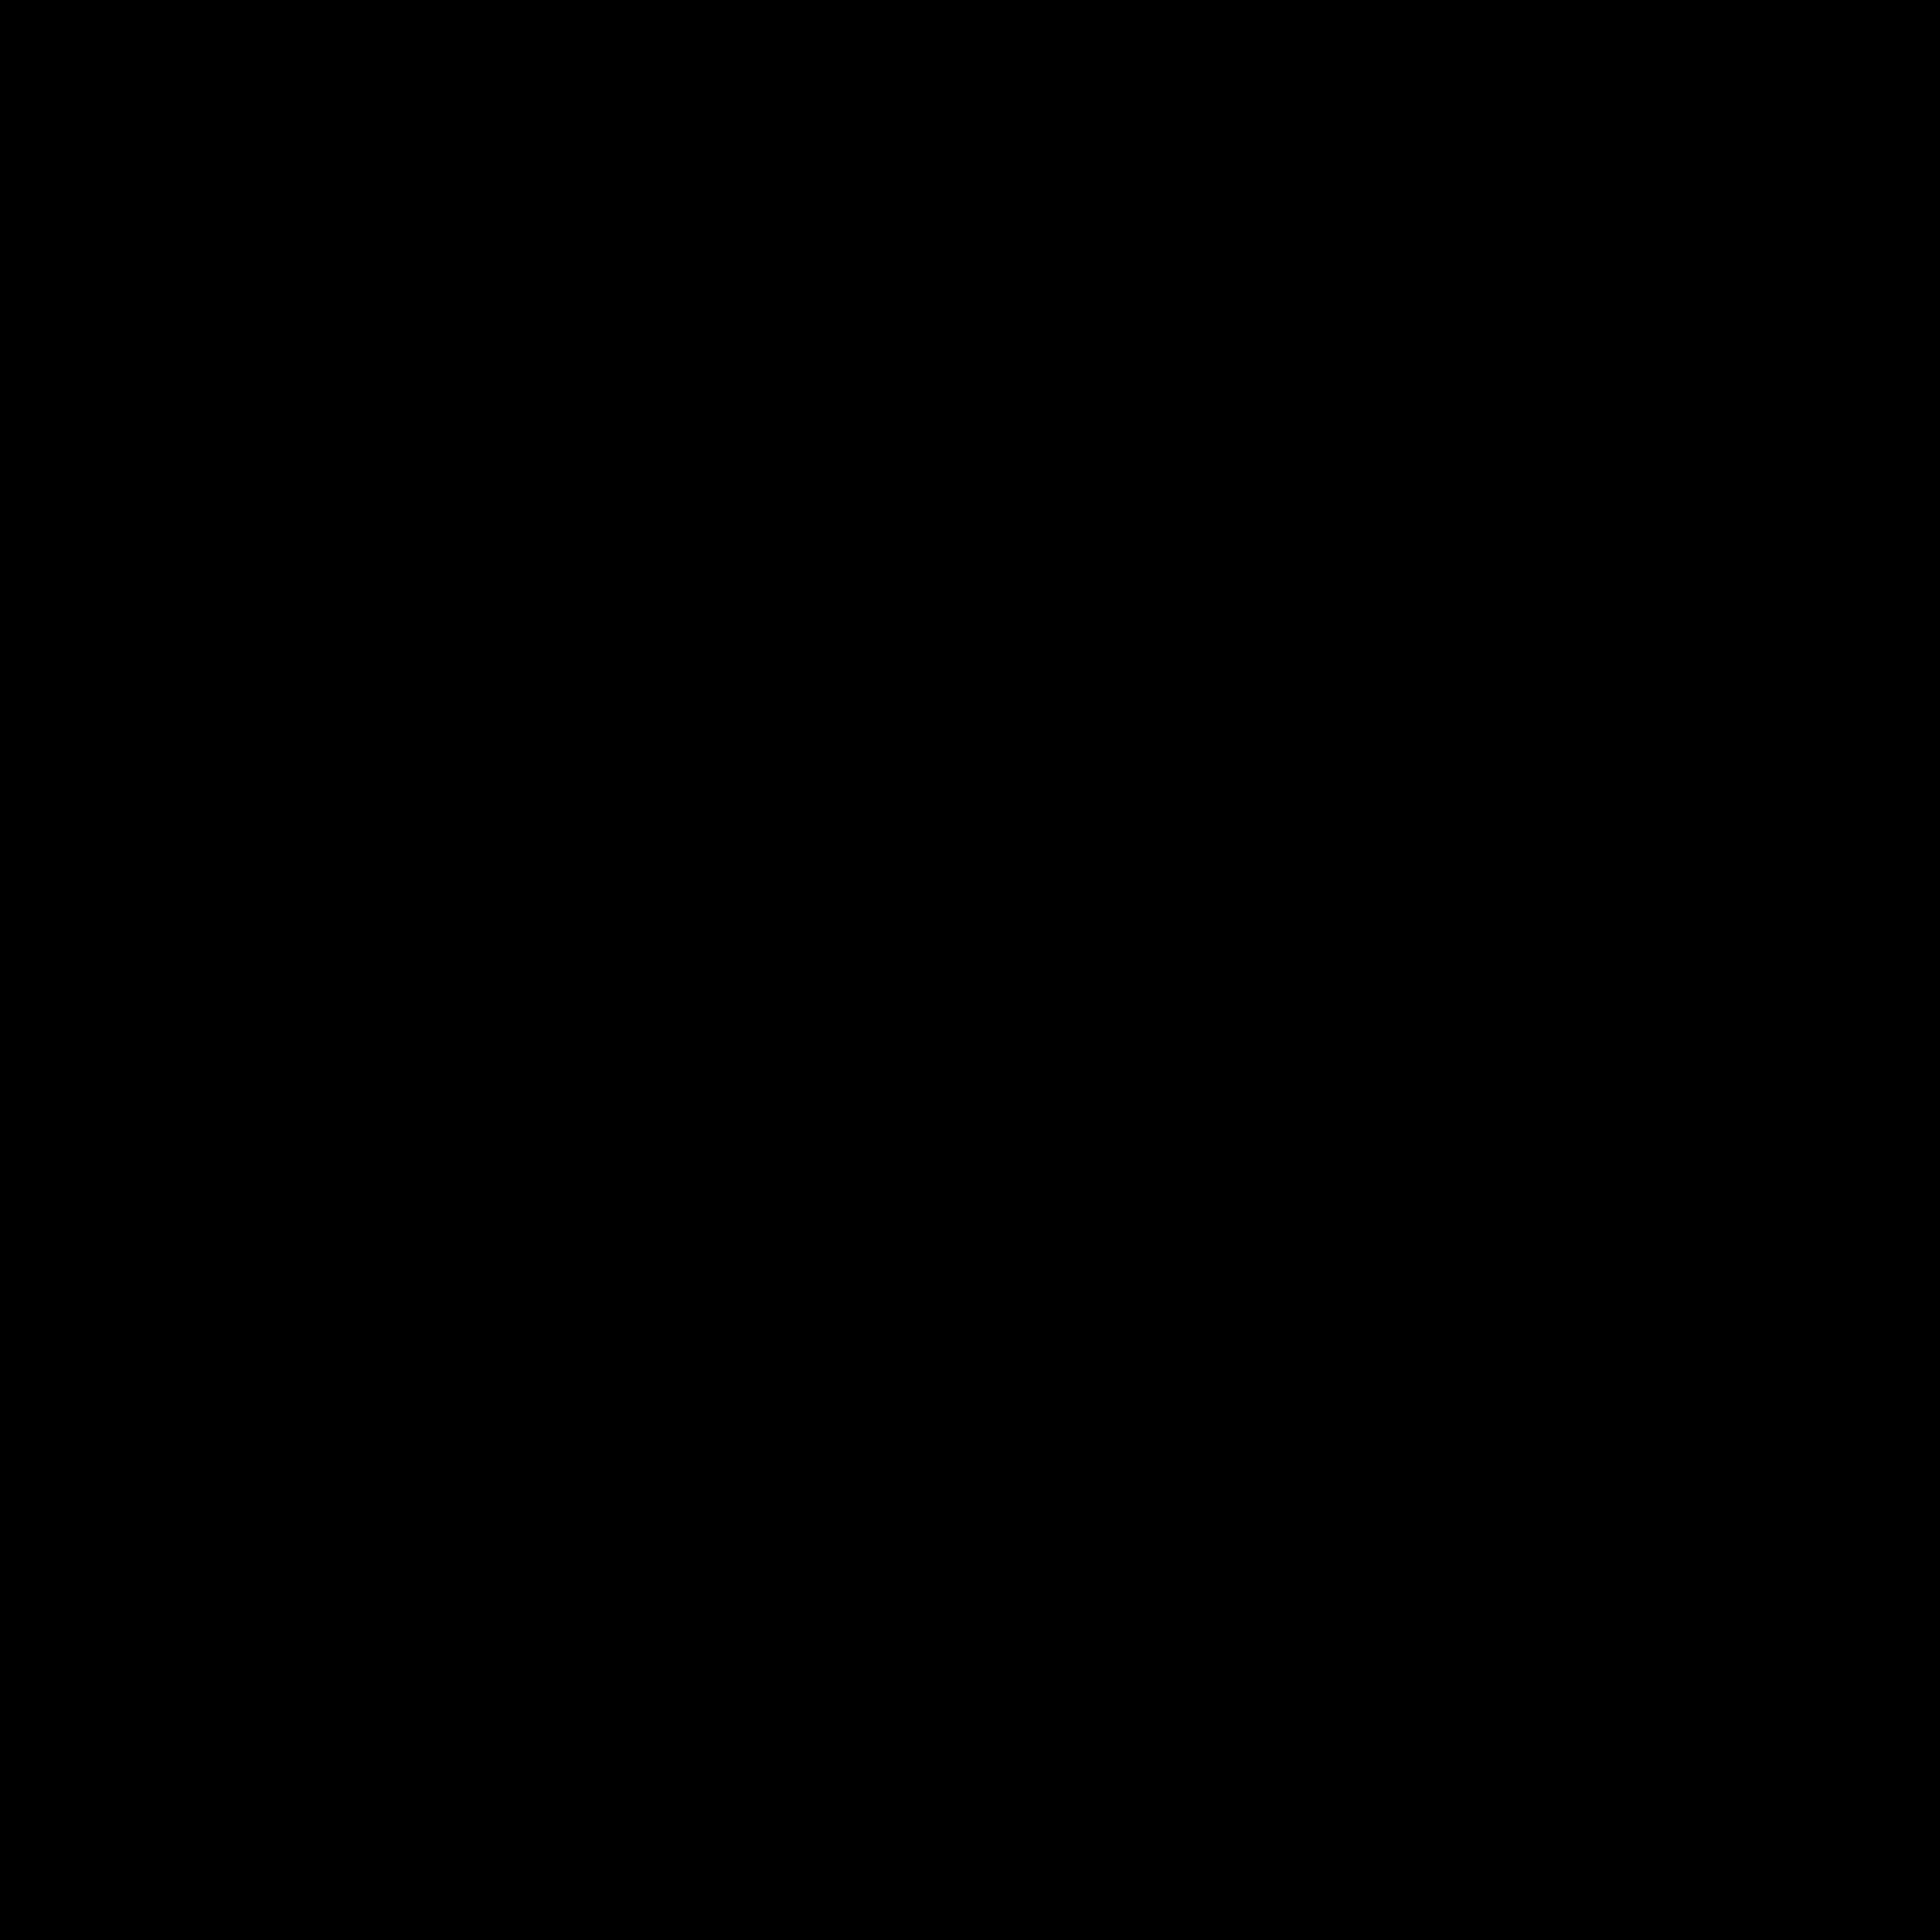 mtv logo 0 - MTV Logo